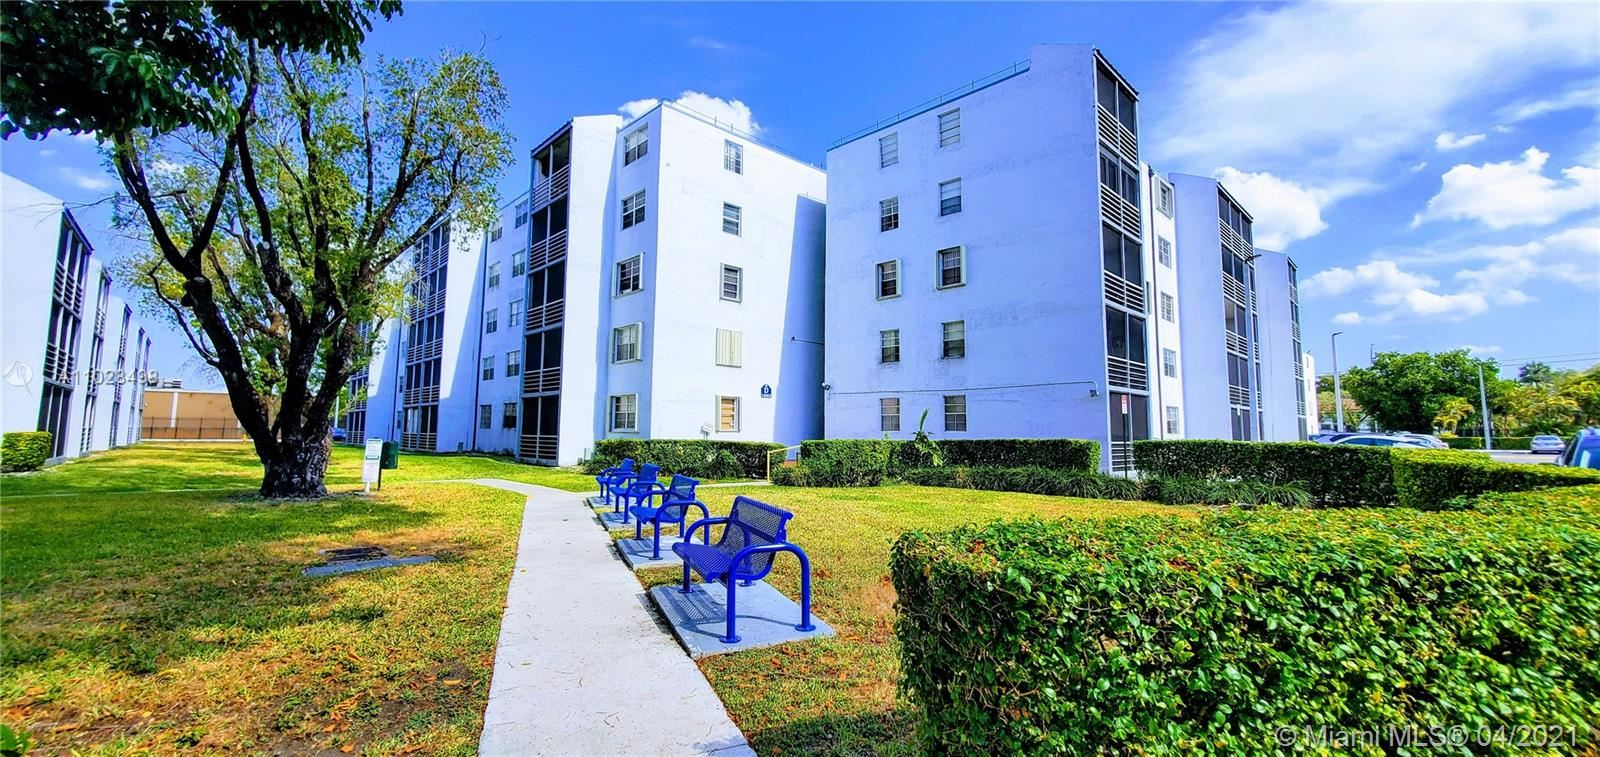 14165 SW 87th St #D105, Miami, FL 33183 - #: A11028498